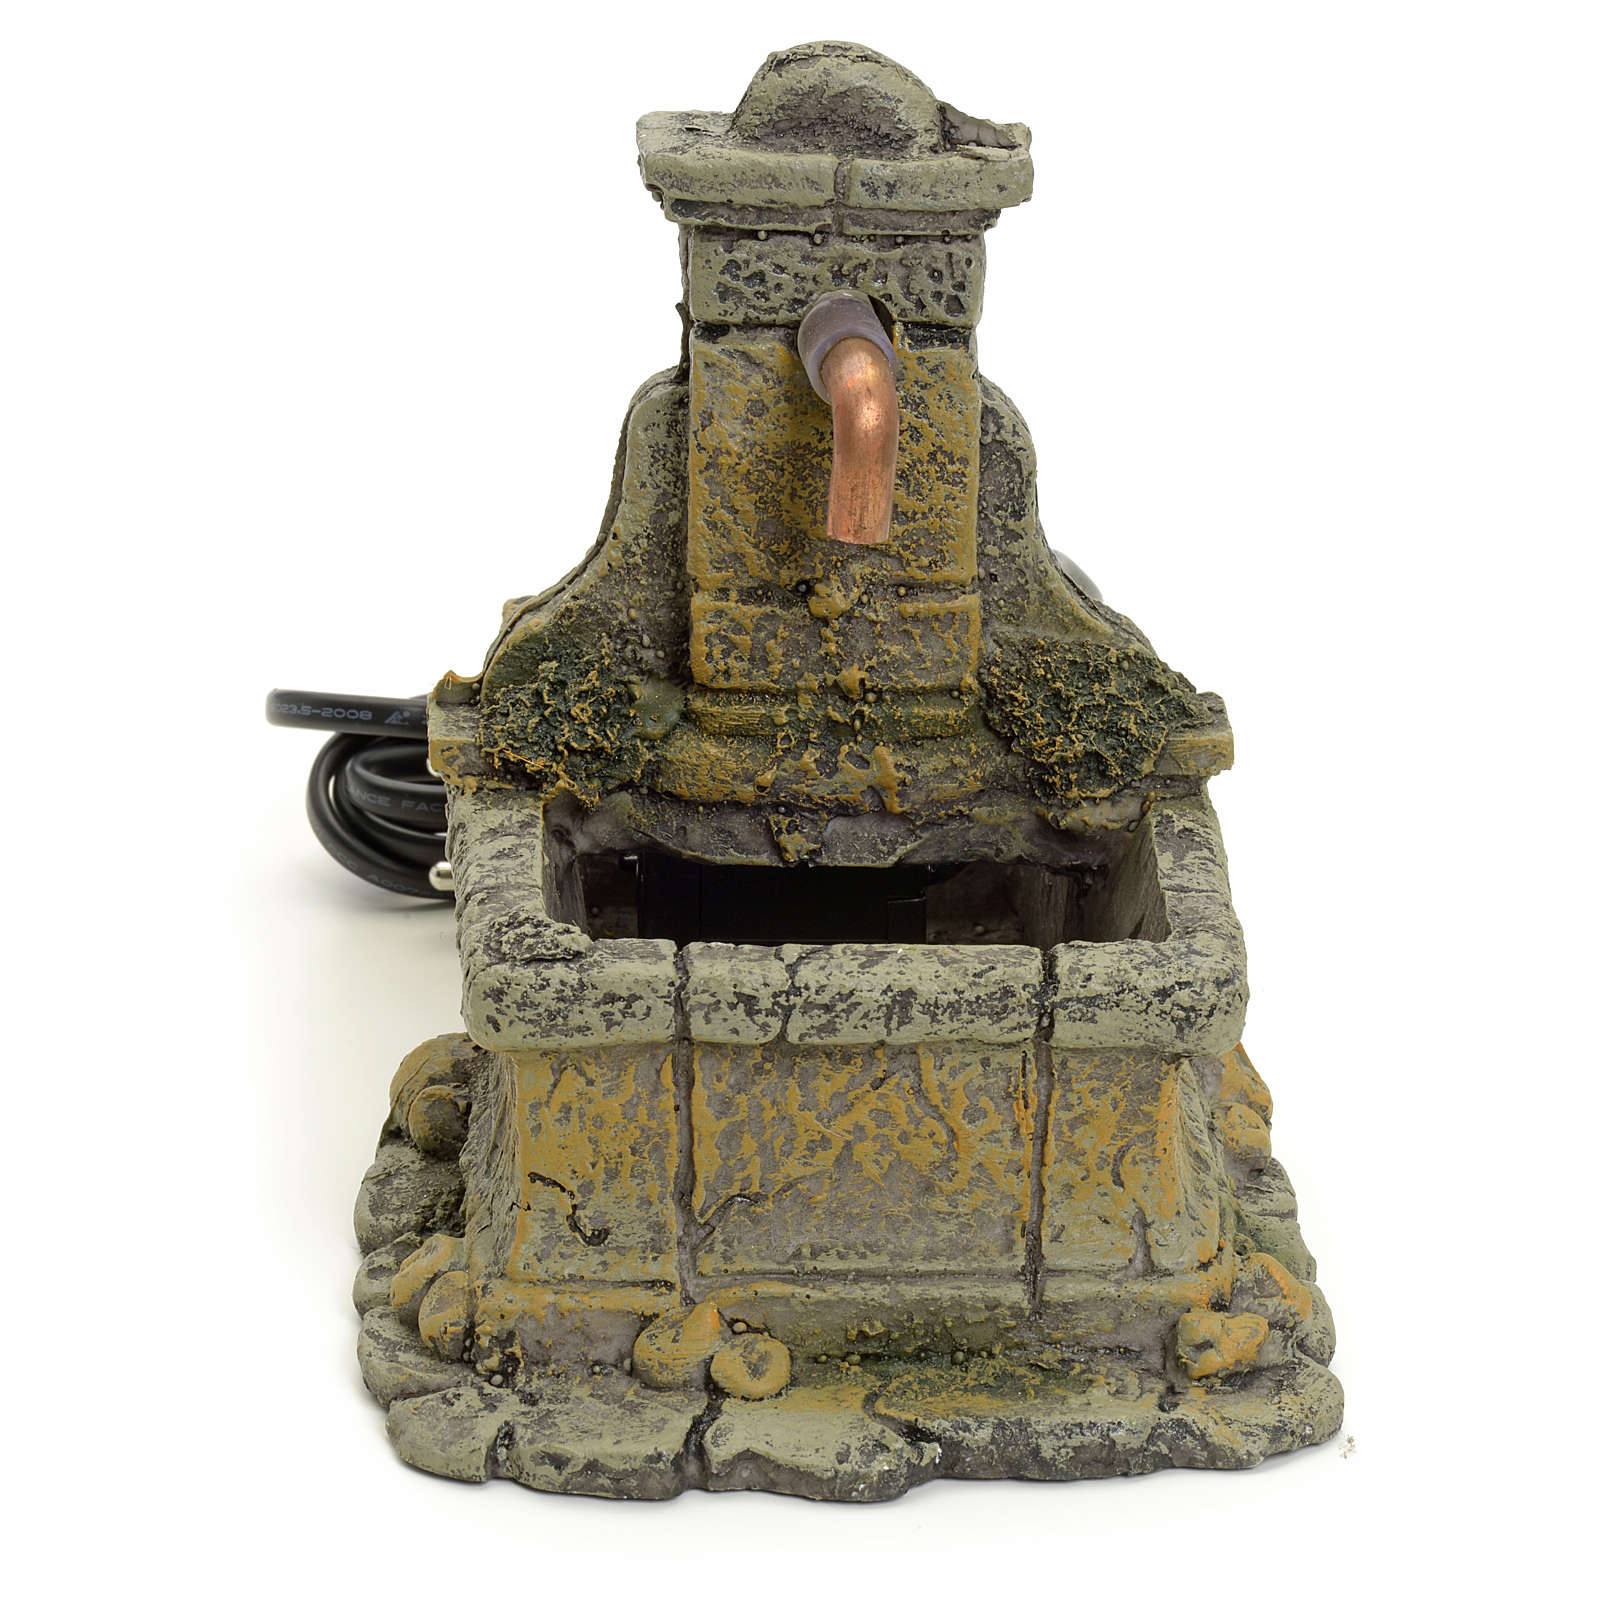 Fuente belén en resina 15x18x12 cm 4